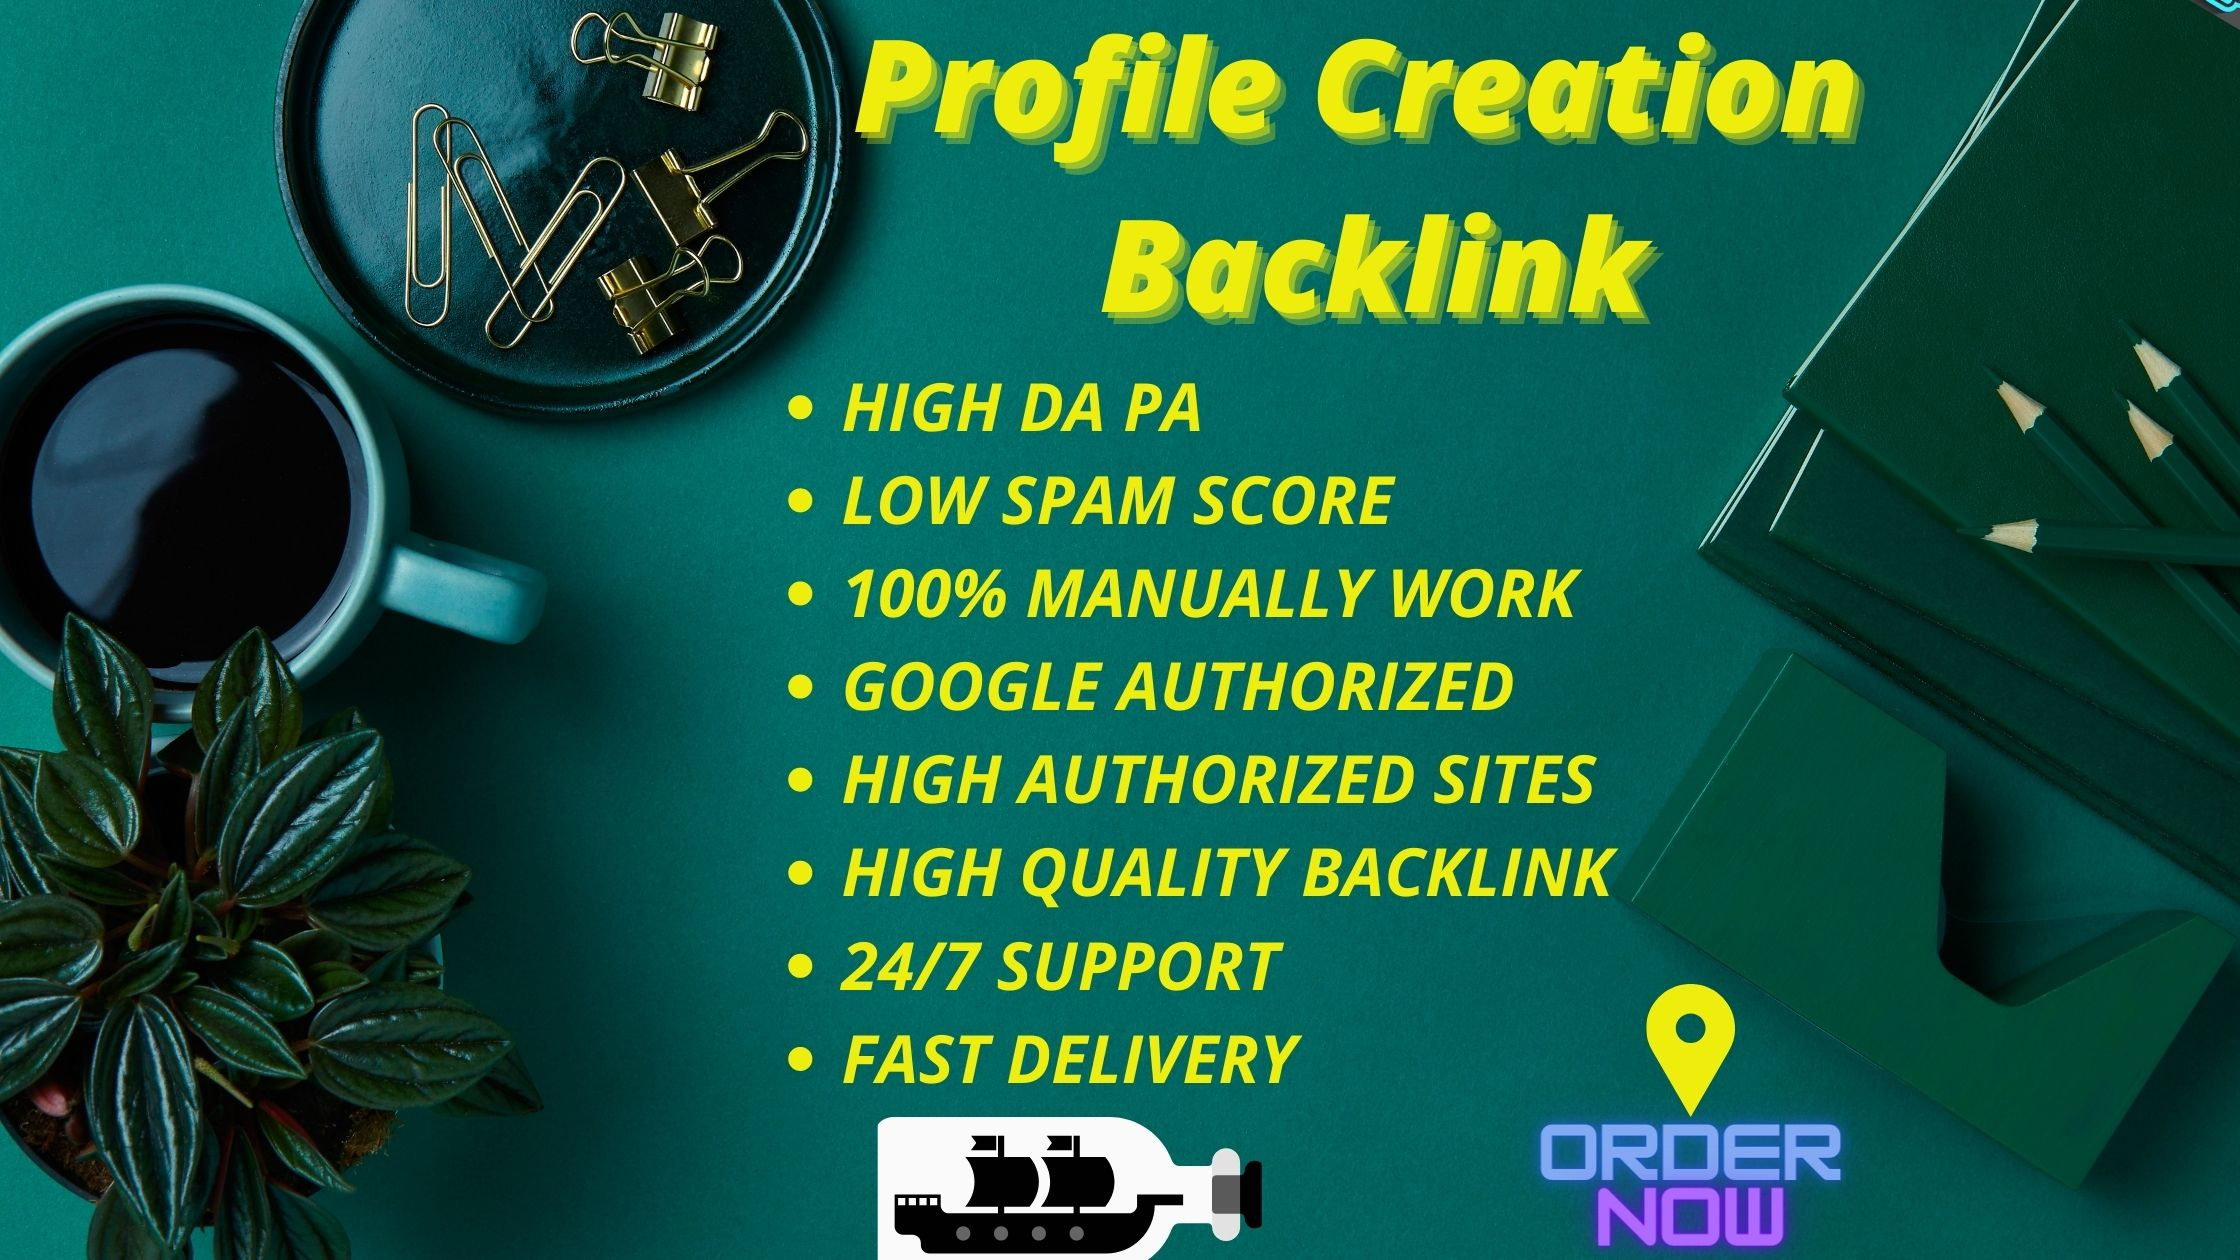 I will manually create 50 profile creation backlinks with high da pa.